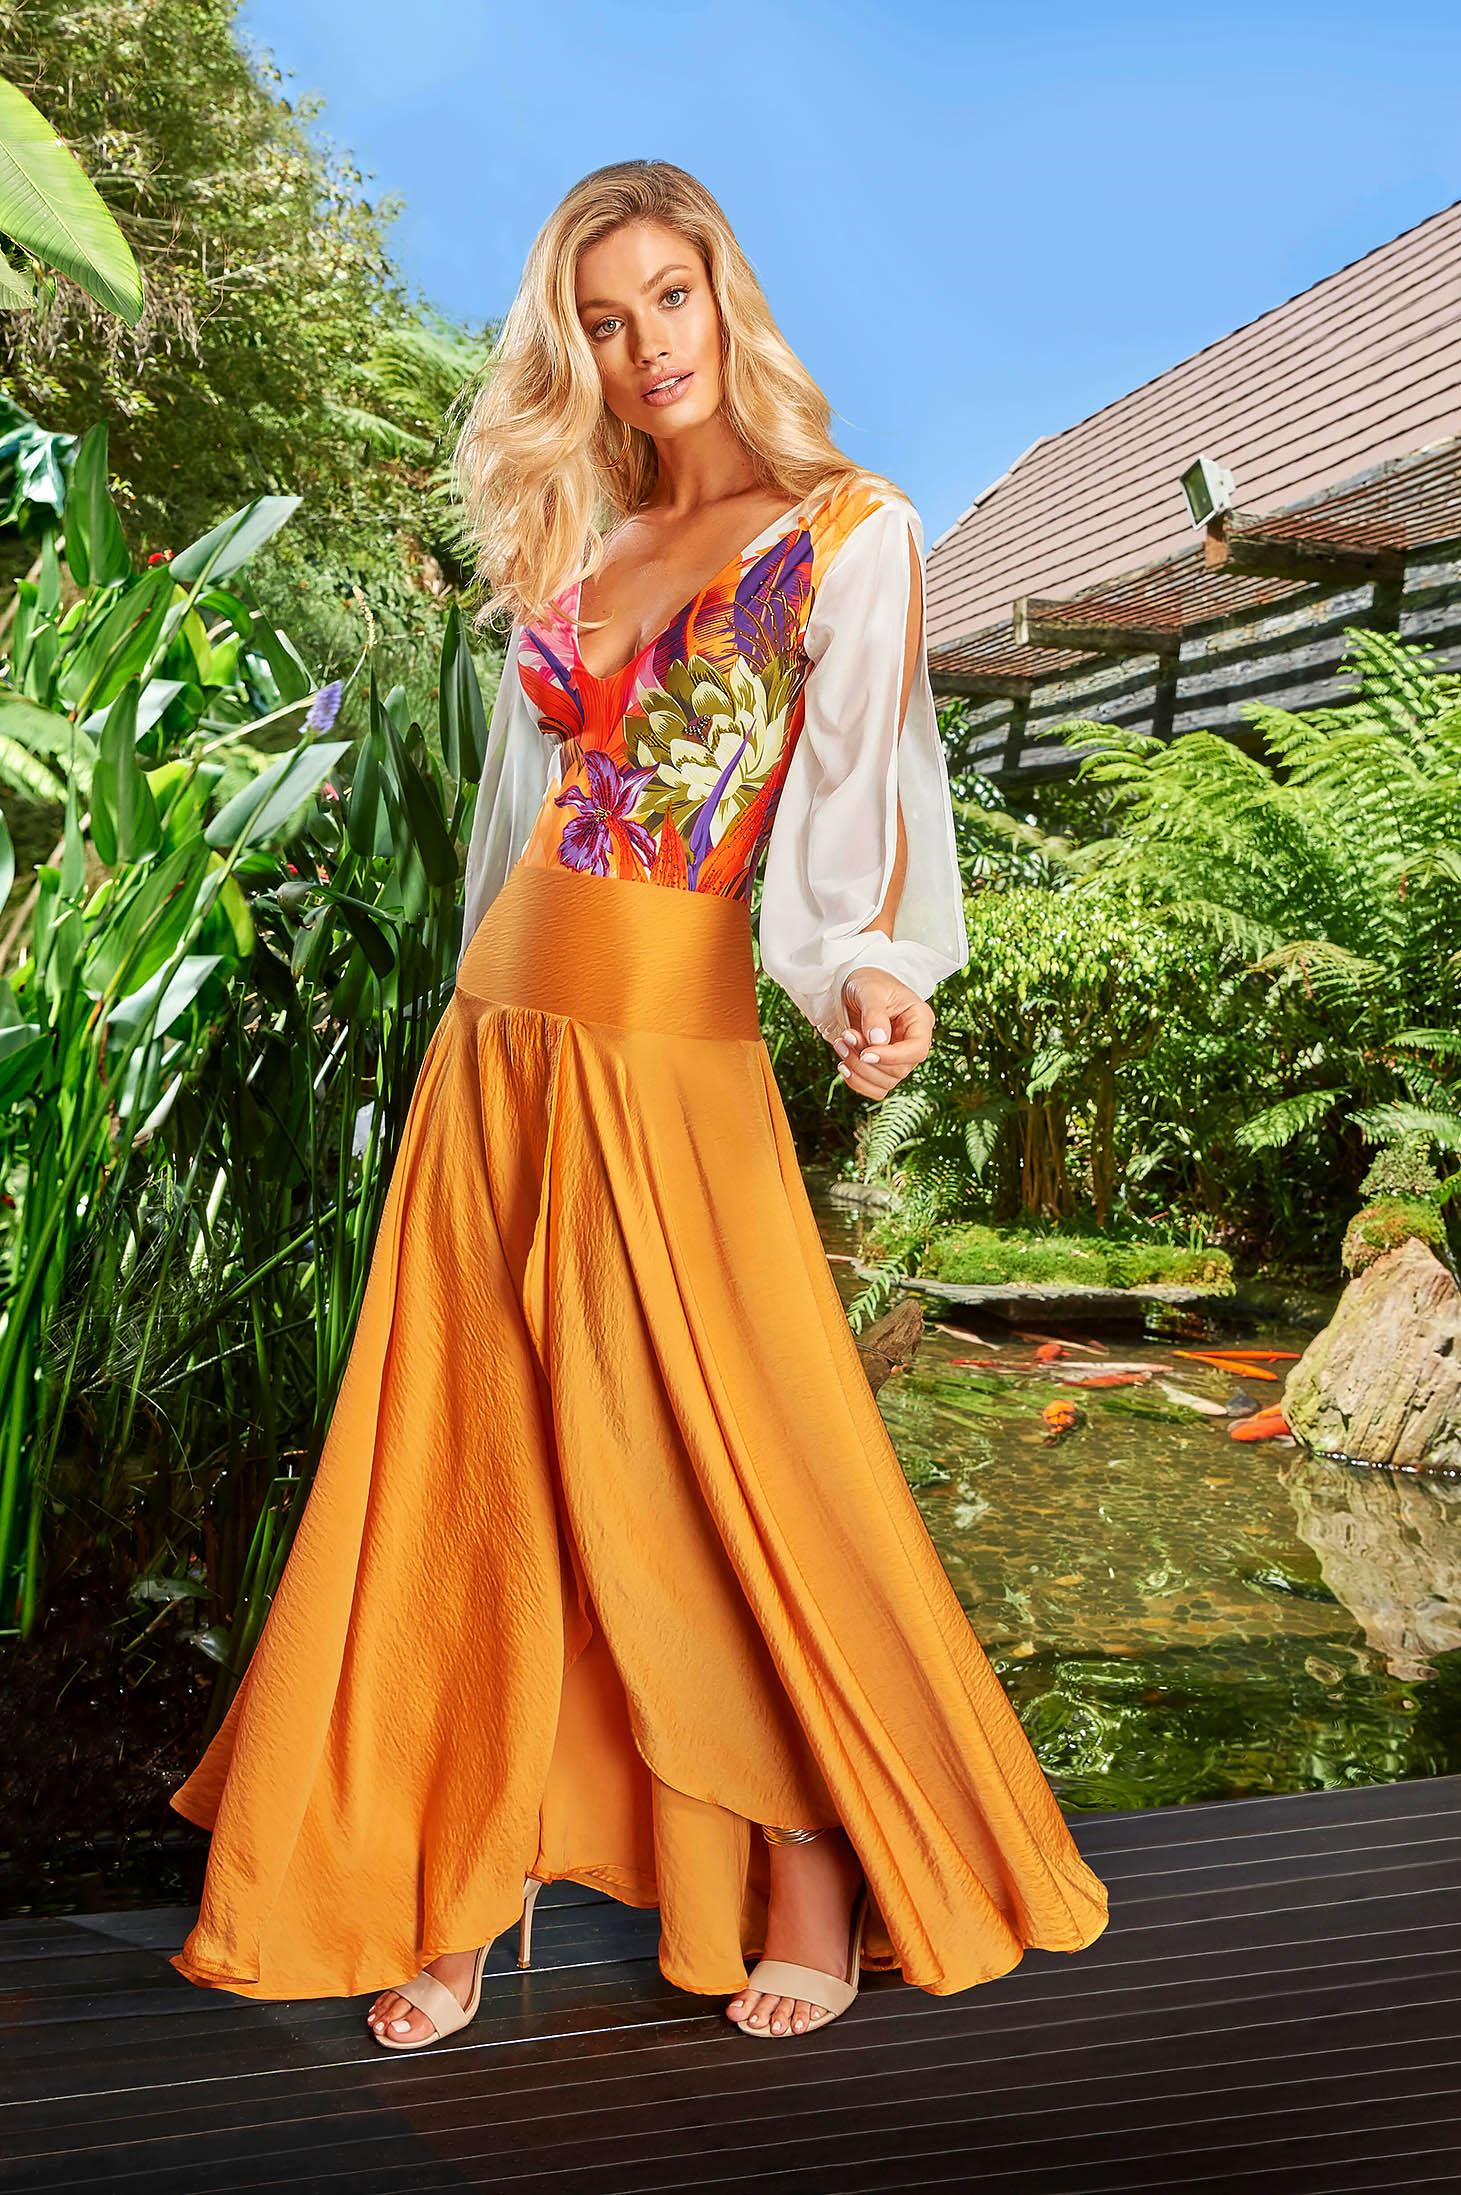 Cosita Linda orange beach wear asymmetrical cloche skirt high waisted